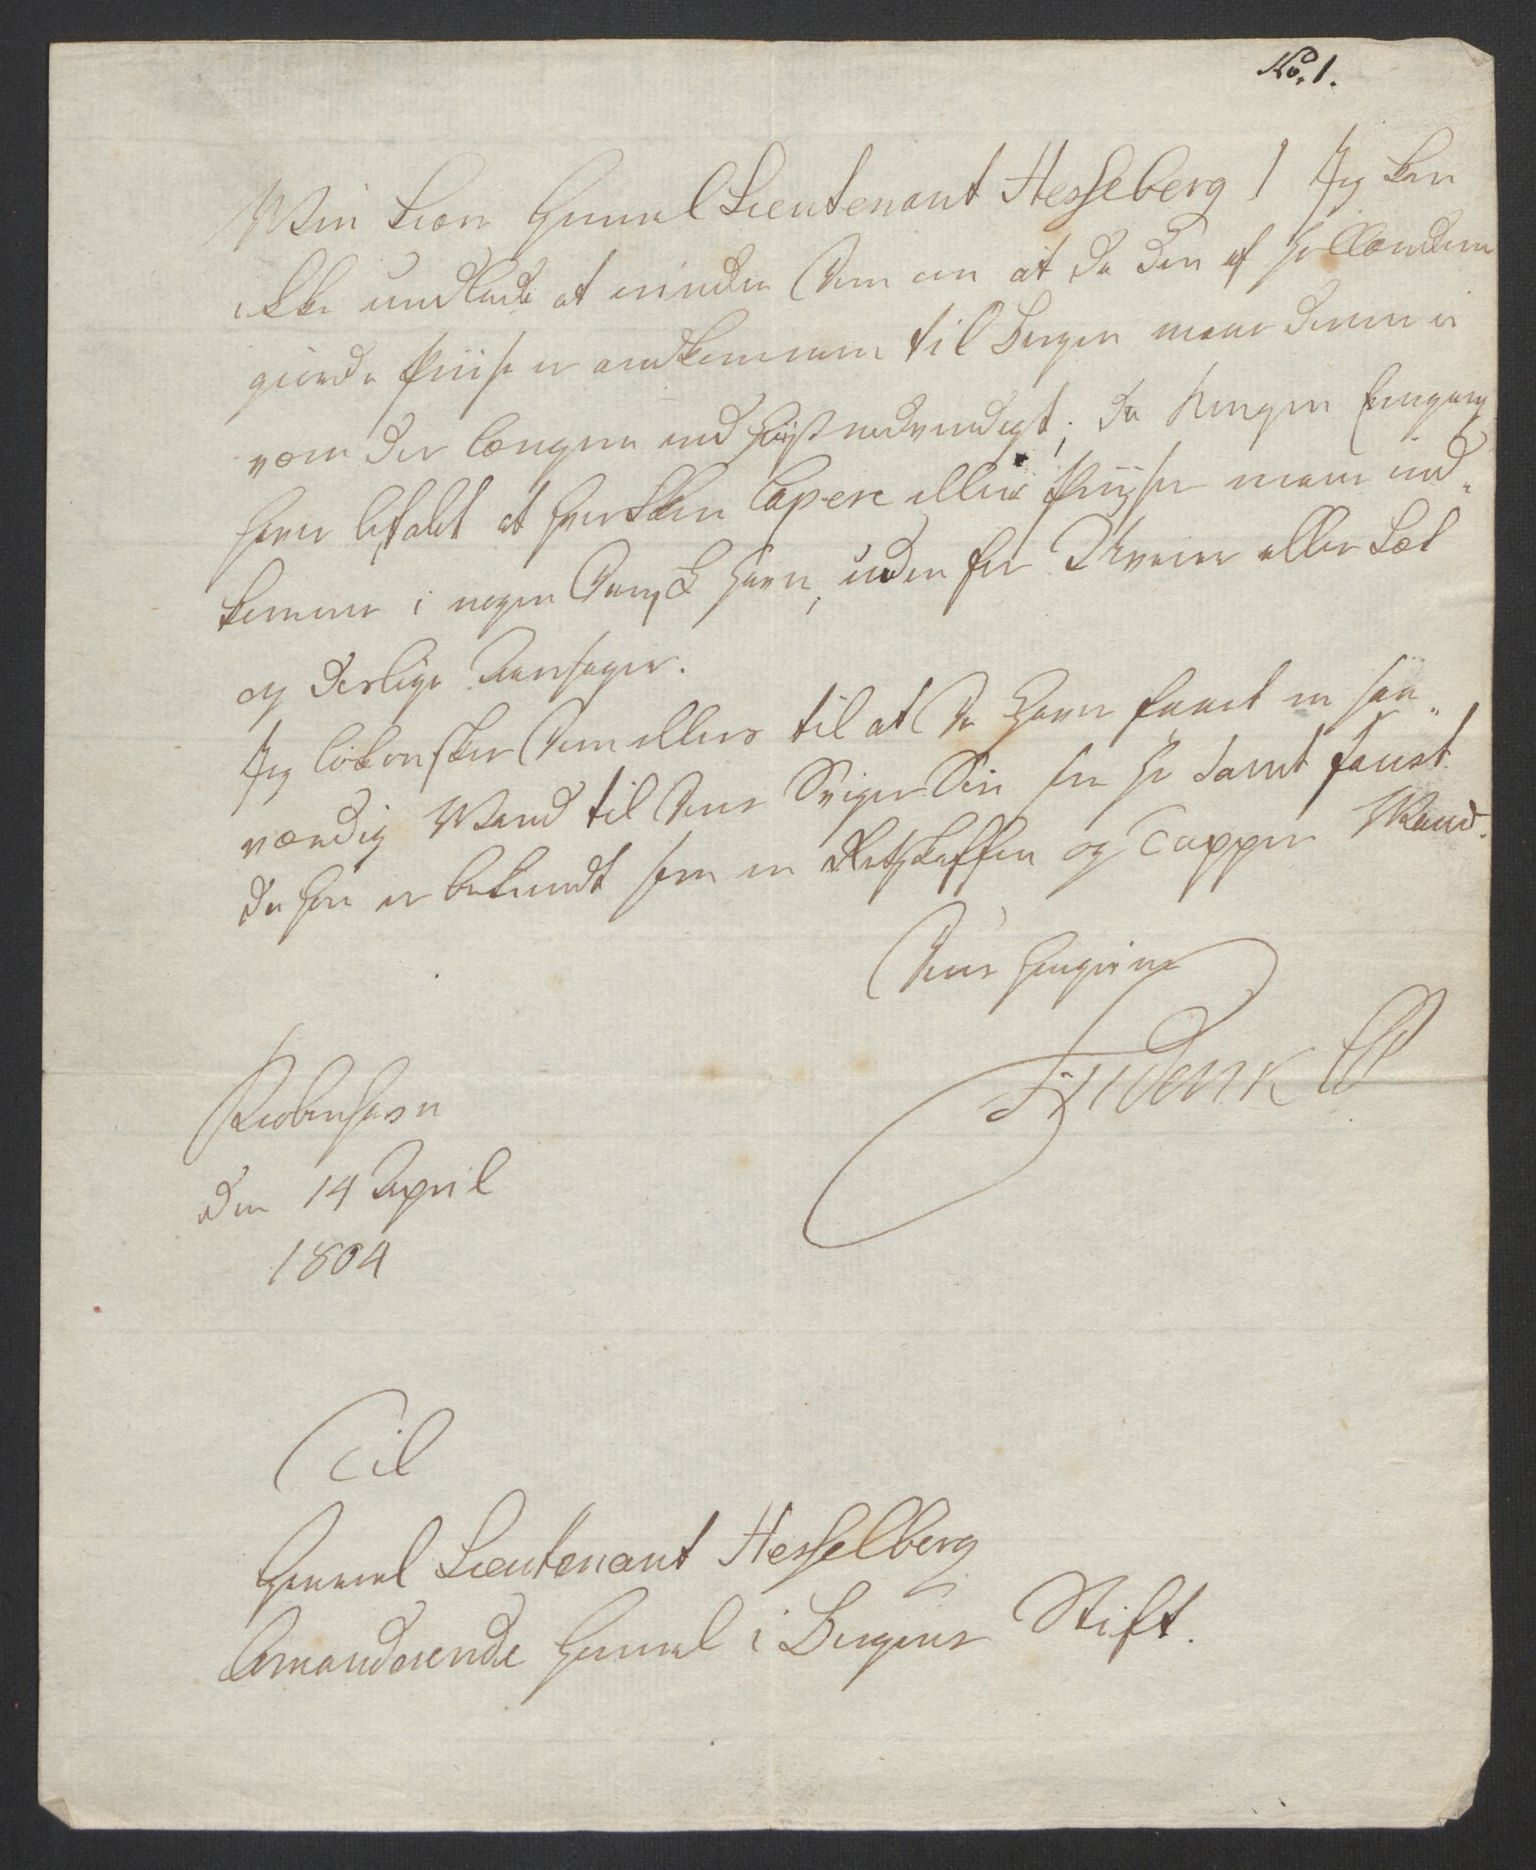 RA, Hesselberg, Hans Jacob Henning, F/L0001: --, 1759-1809, s. 85